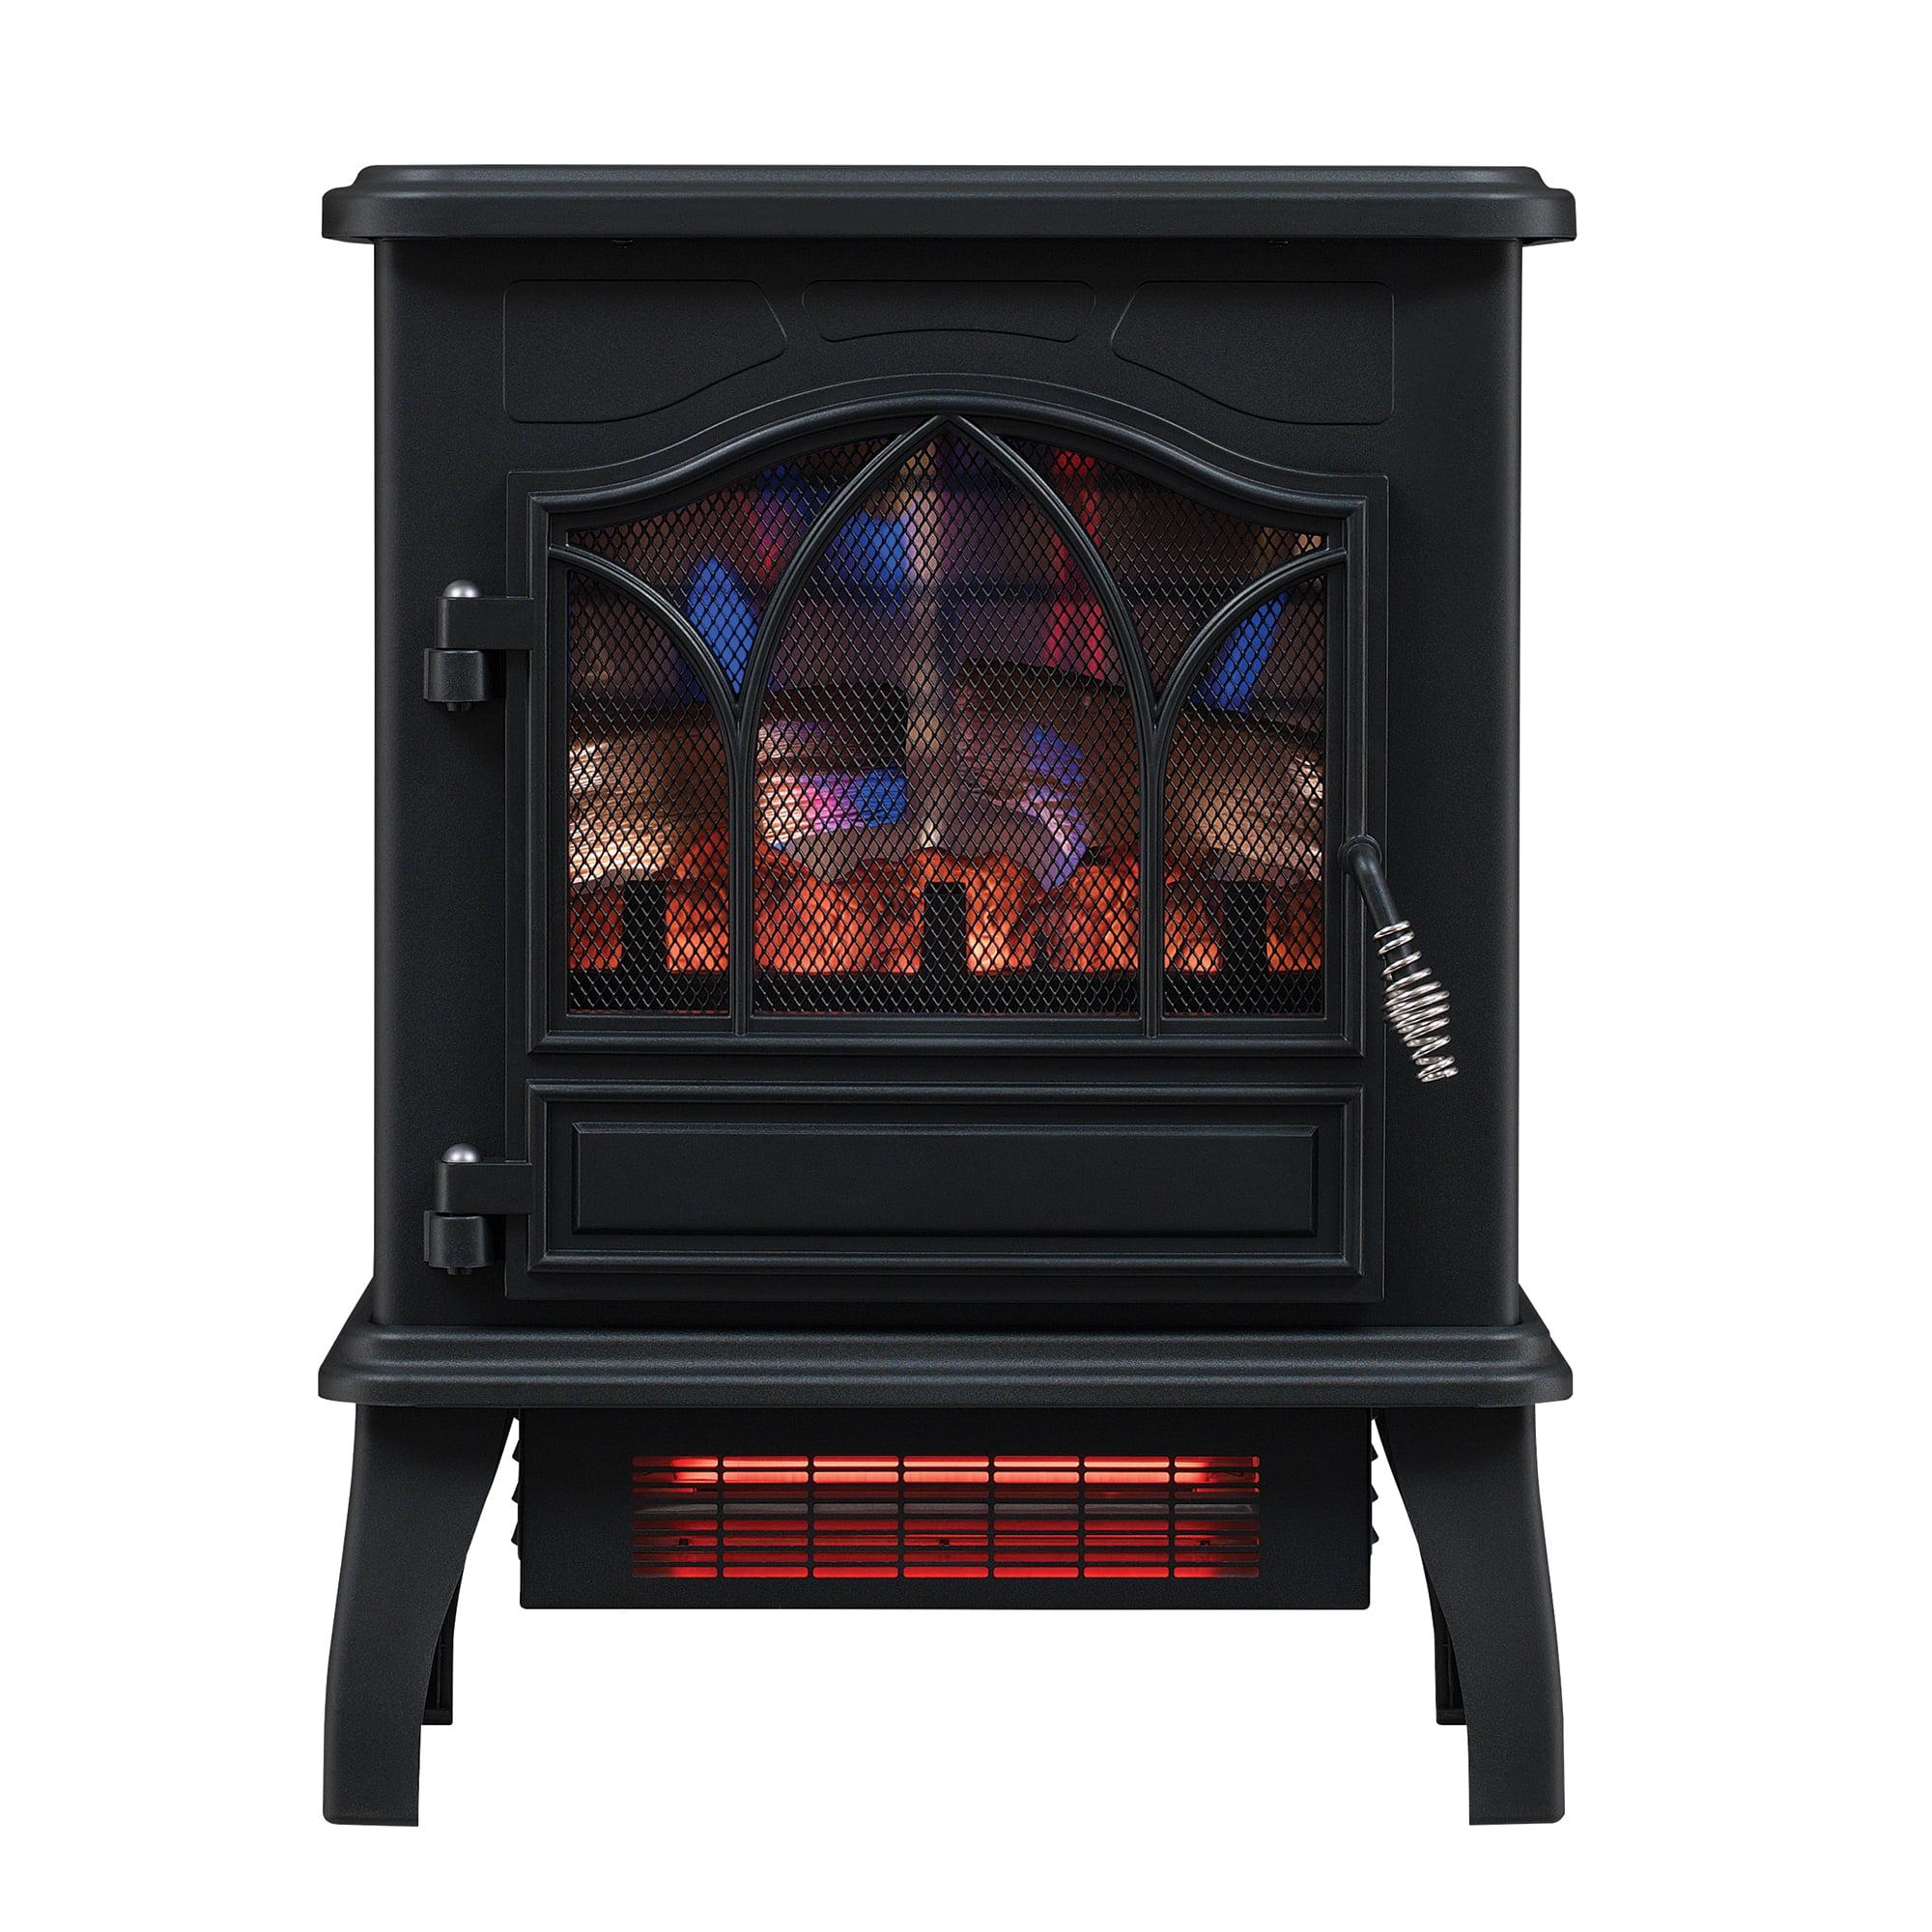 ChimneyFree Infrared Quartz Electric Space Heater $64.99